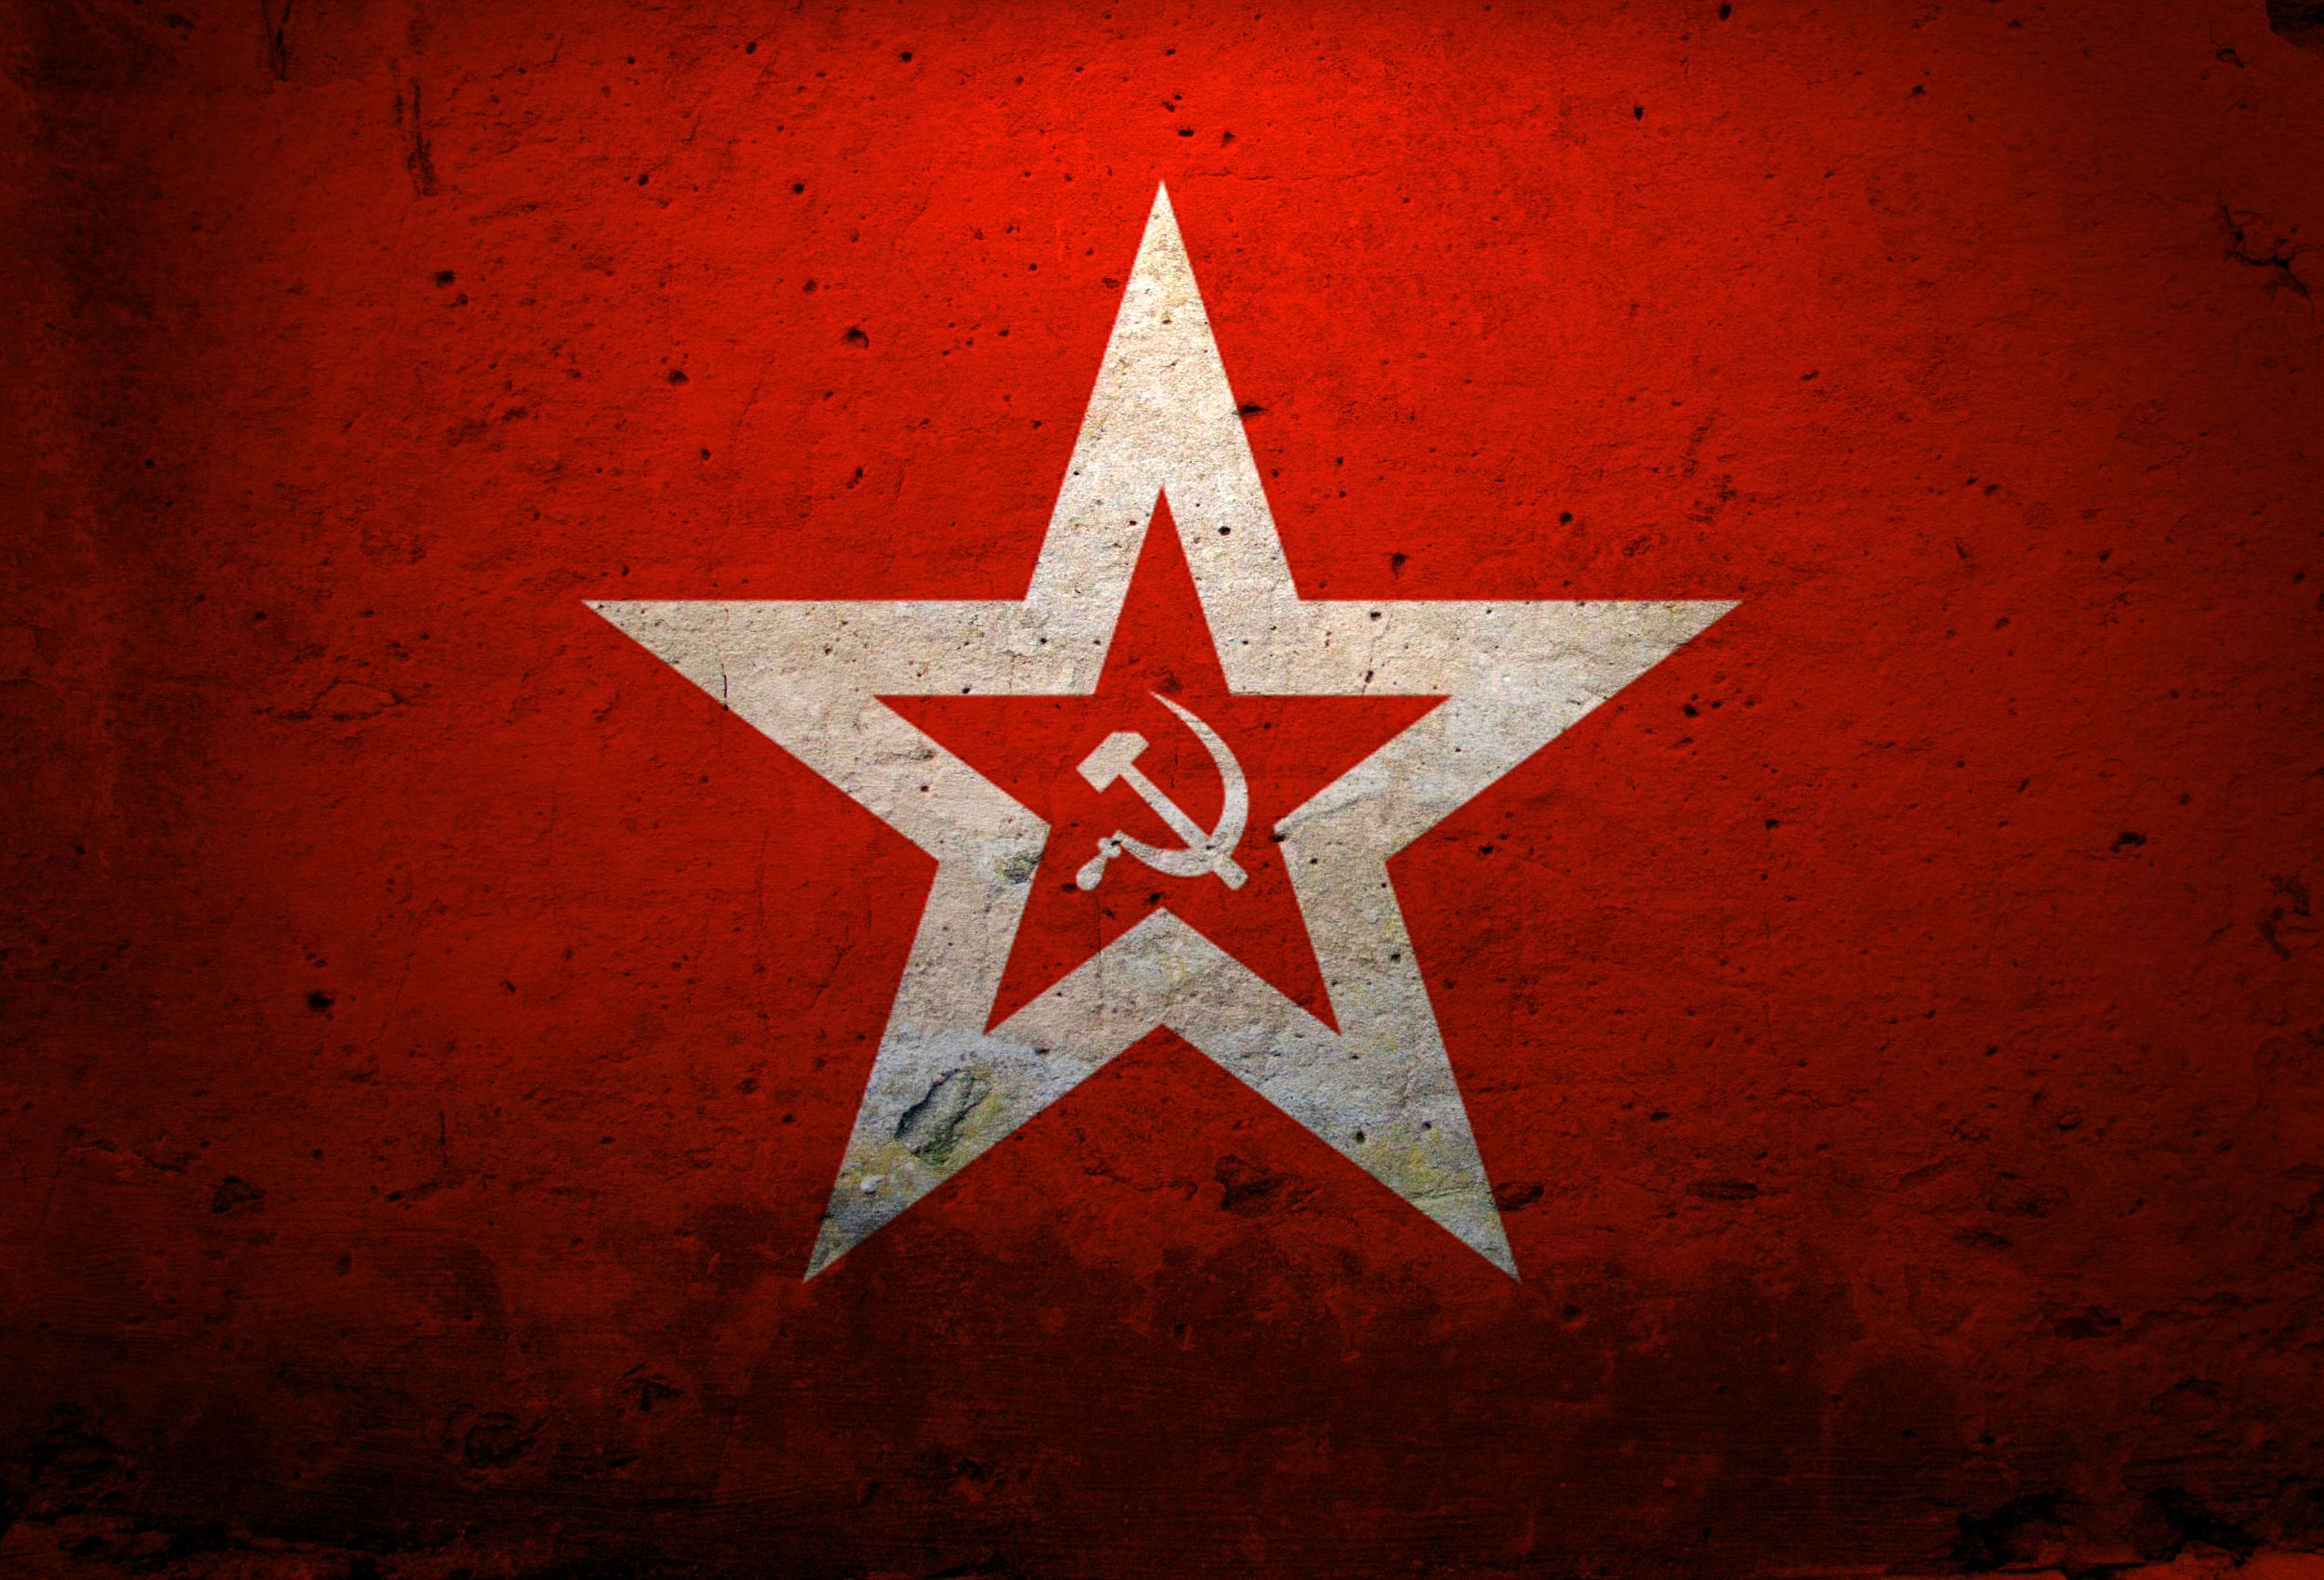 Soviet Union Soviet Union Wallpaper Wallpaper Flags Wallpaper Hammer and sickle hd wallpaper